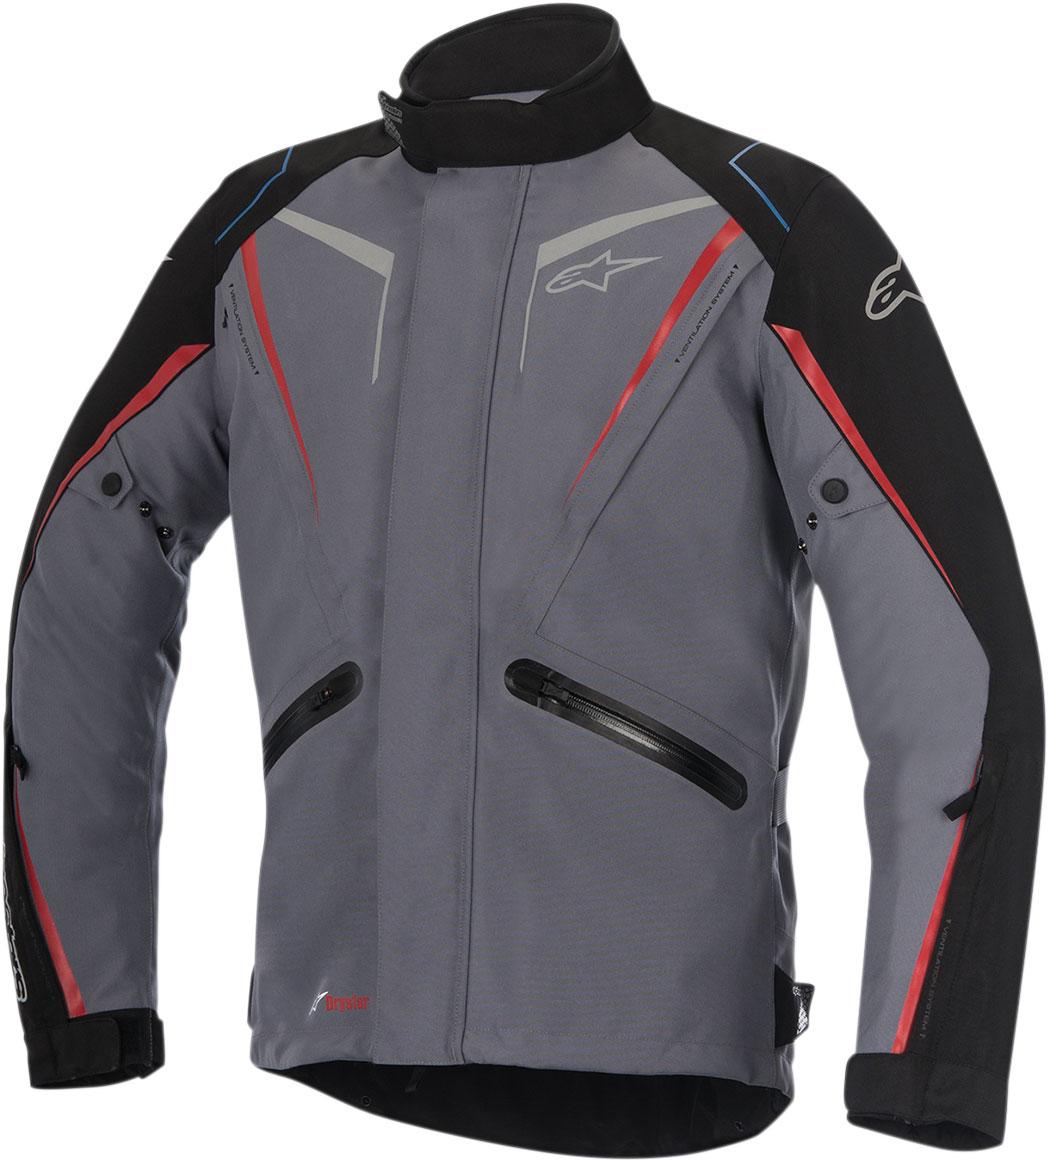 Alpinestars YOKOHAMA Drystar Adventure-Touring Jacket (Gray/Black/Red)